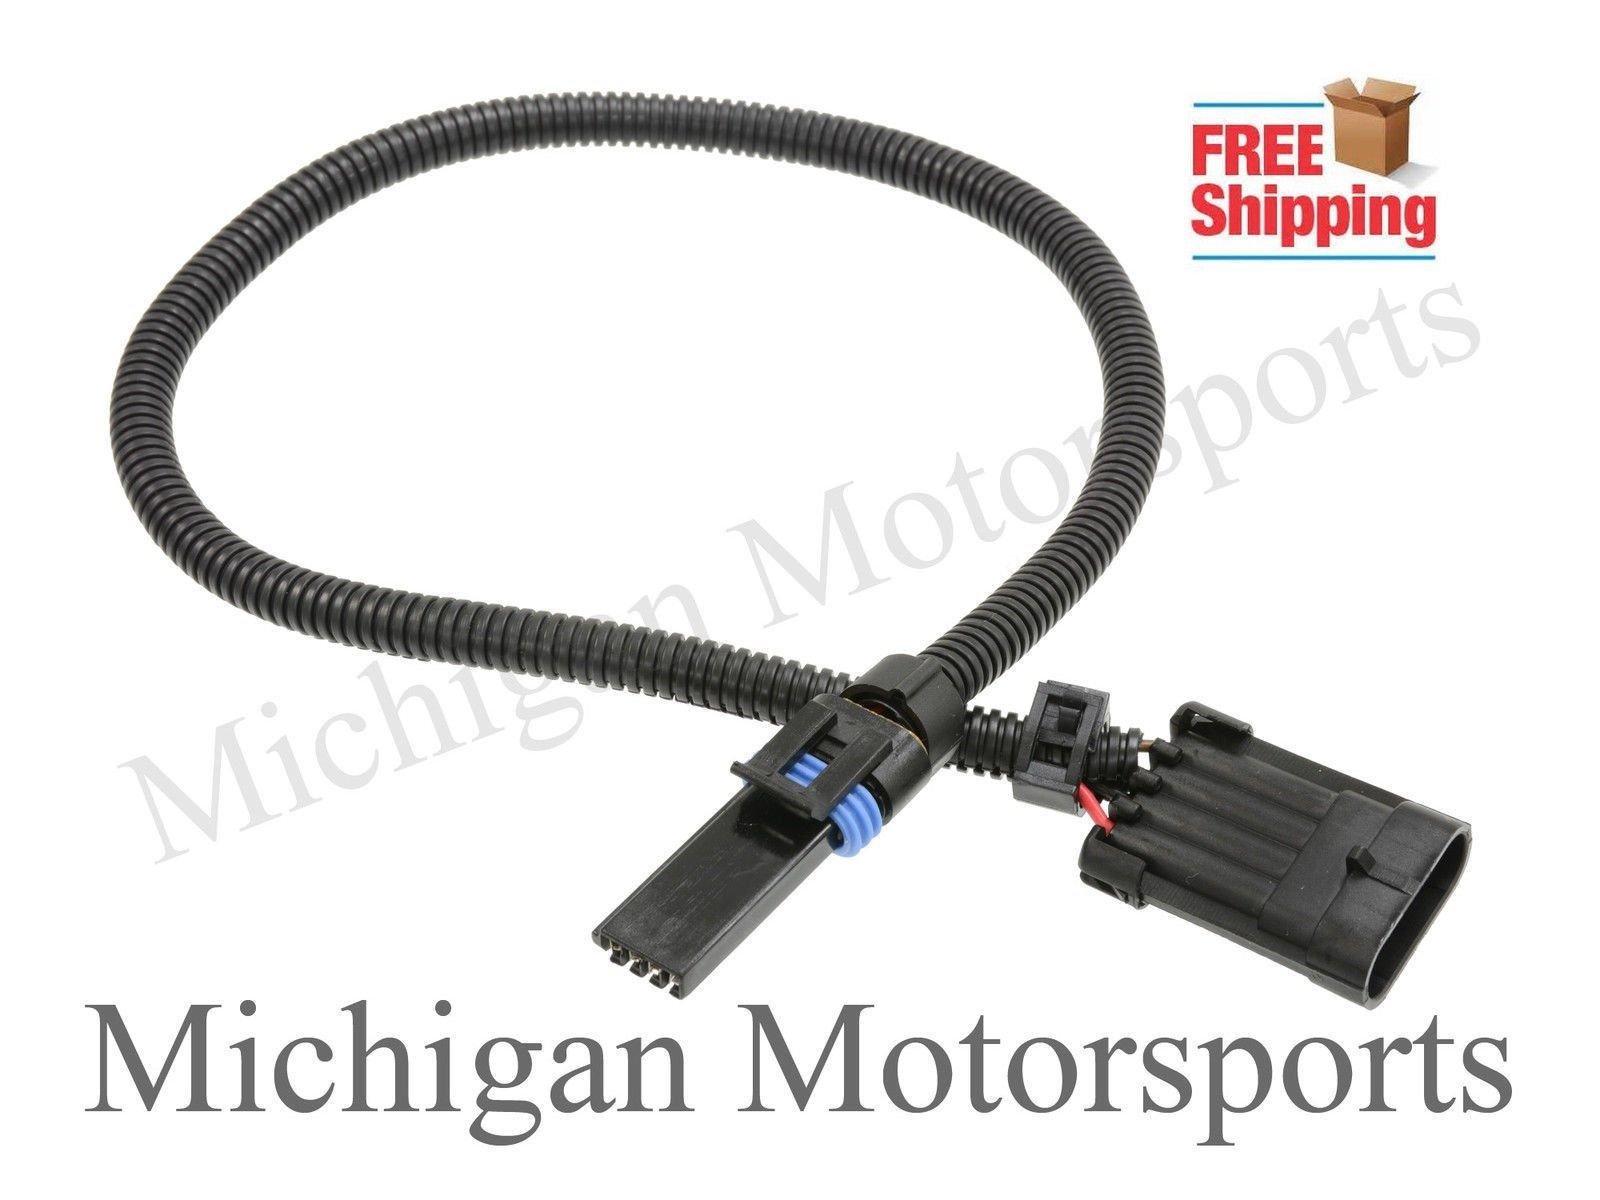 Michigan Motorsports Optispark Vented Wiring Harness Connector Lt1 Fits Camaro Firebird Distributor 57l